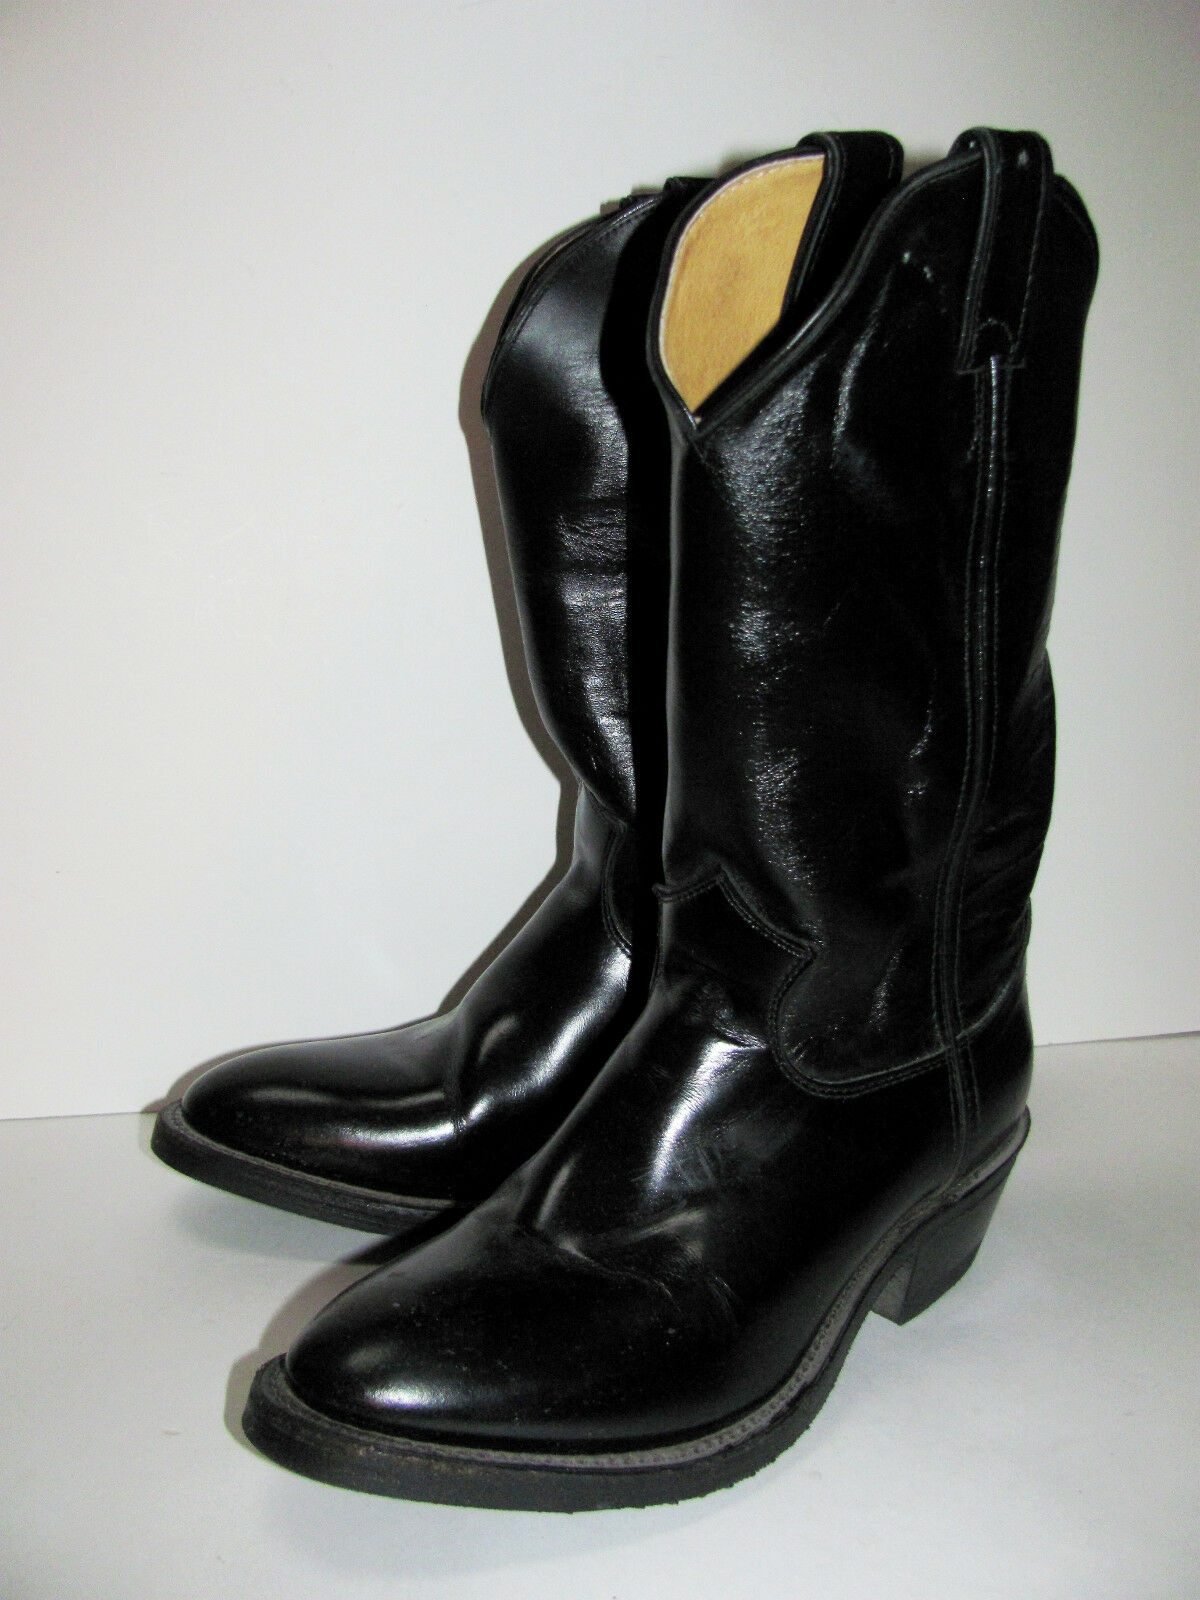 Justin Para Hombre Negro melo-veal bota, Tamaño 8.5 B